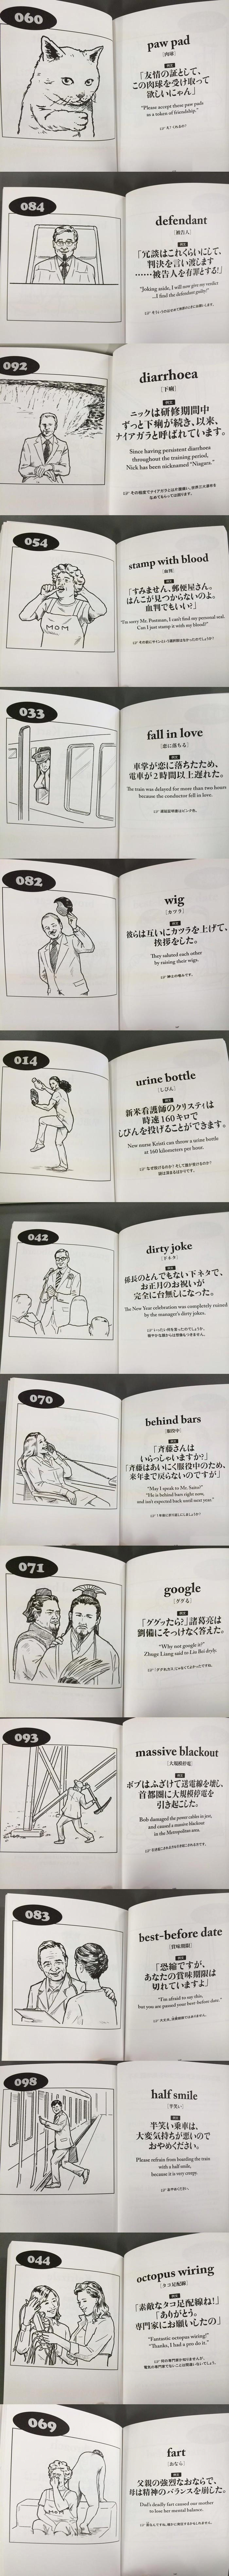 japans-oddest-english-book.jpg